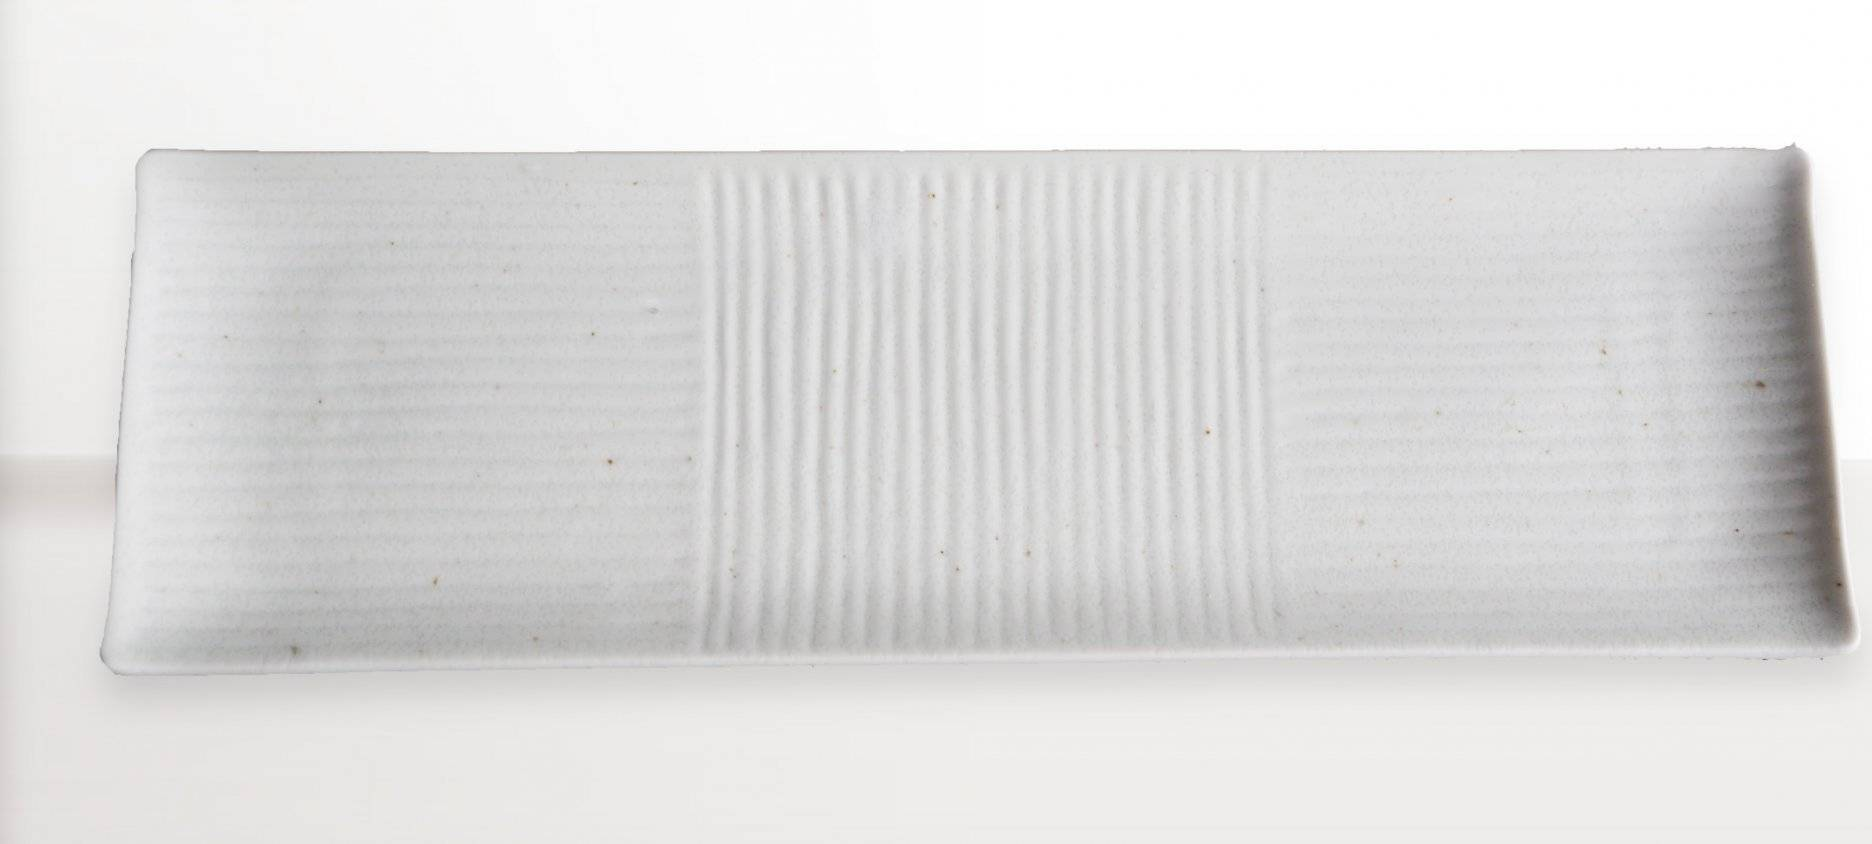 Hranatý talíř na sushi Lines bílý 33 x 10 cm C7851 MIJ